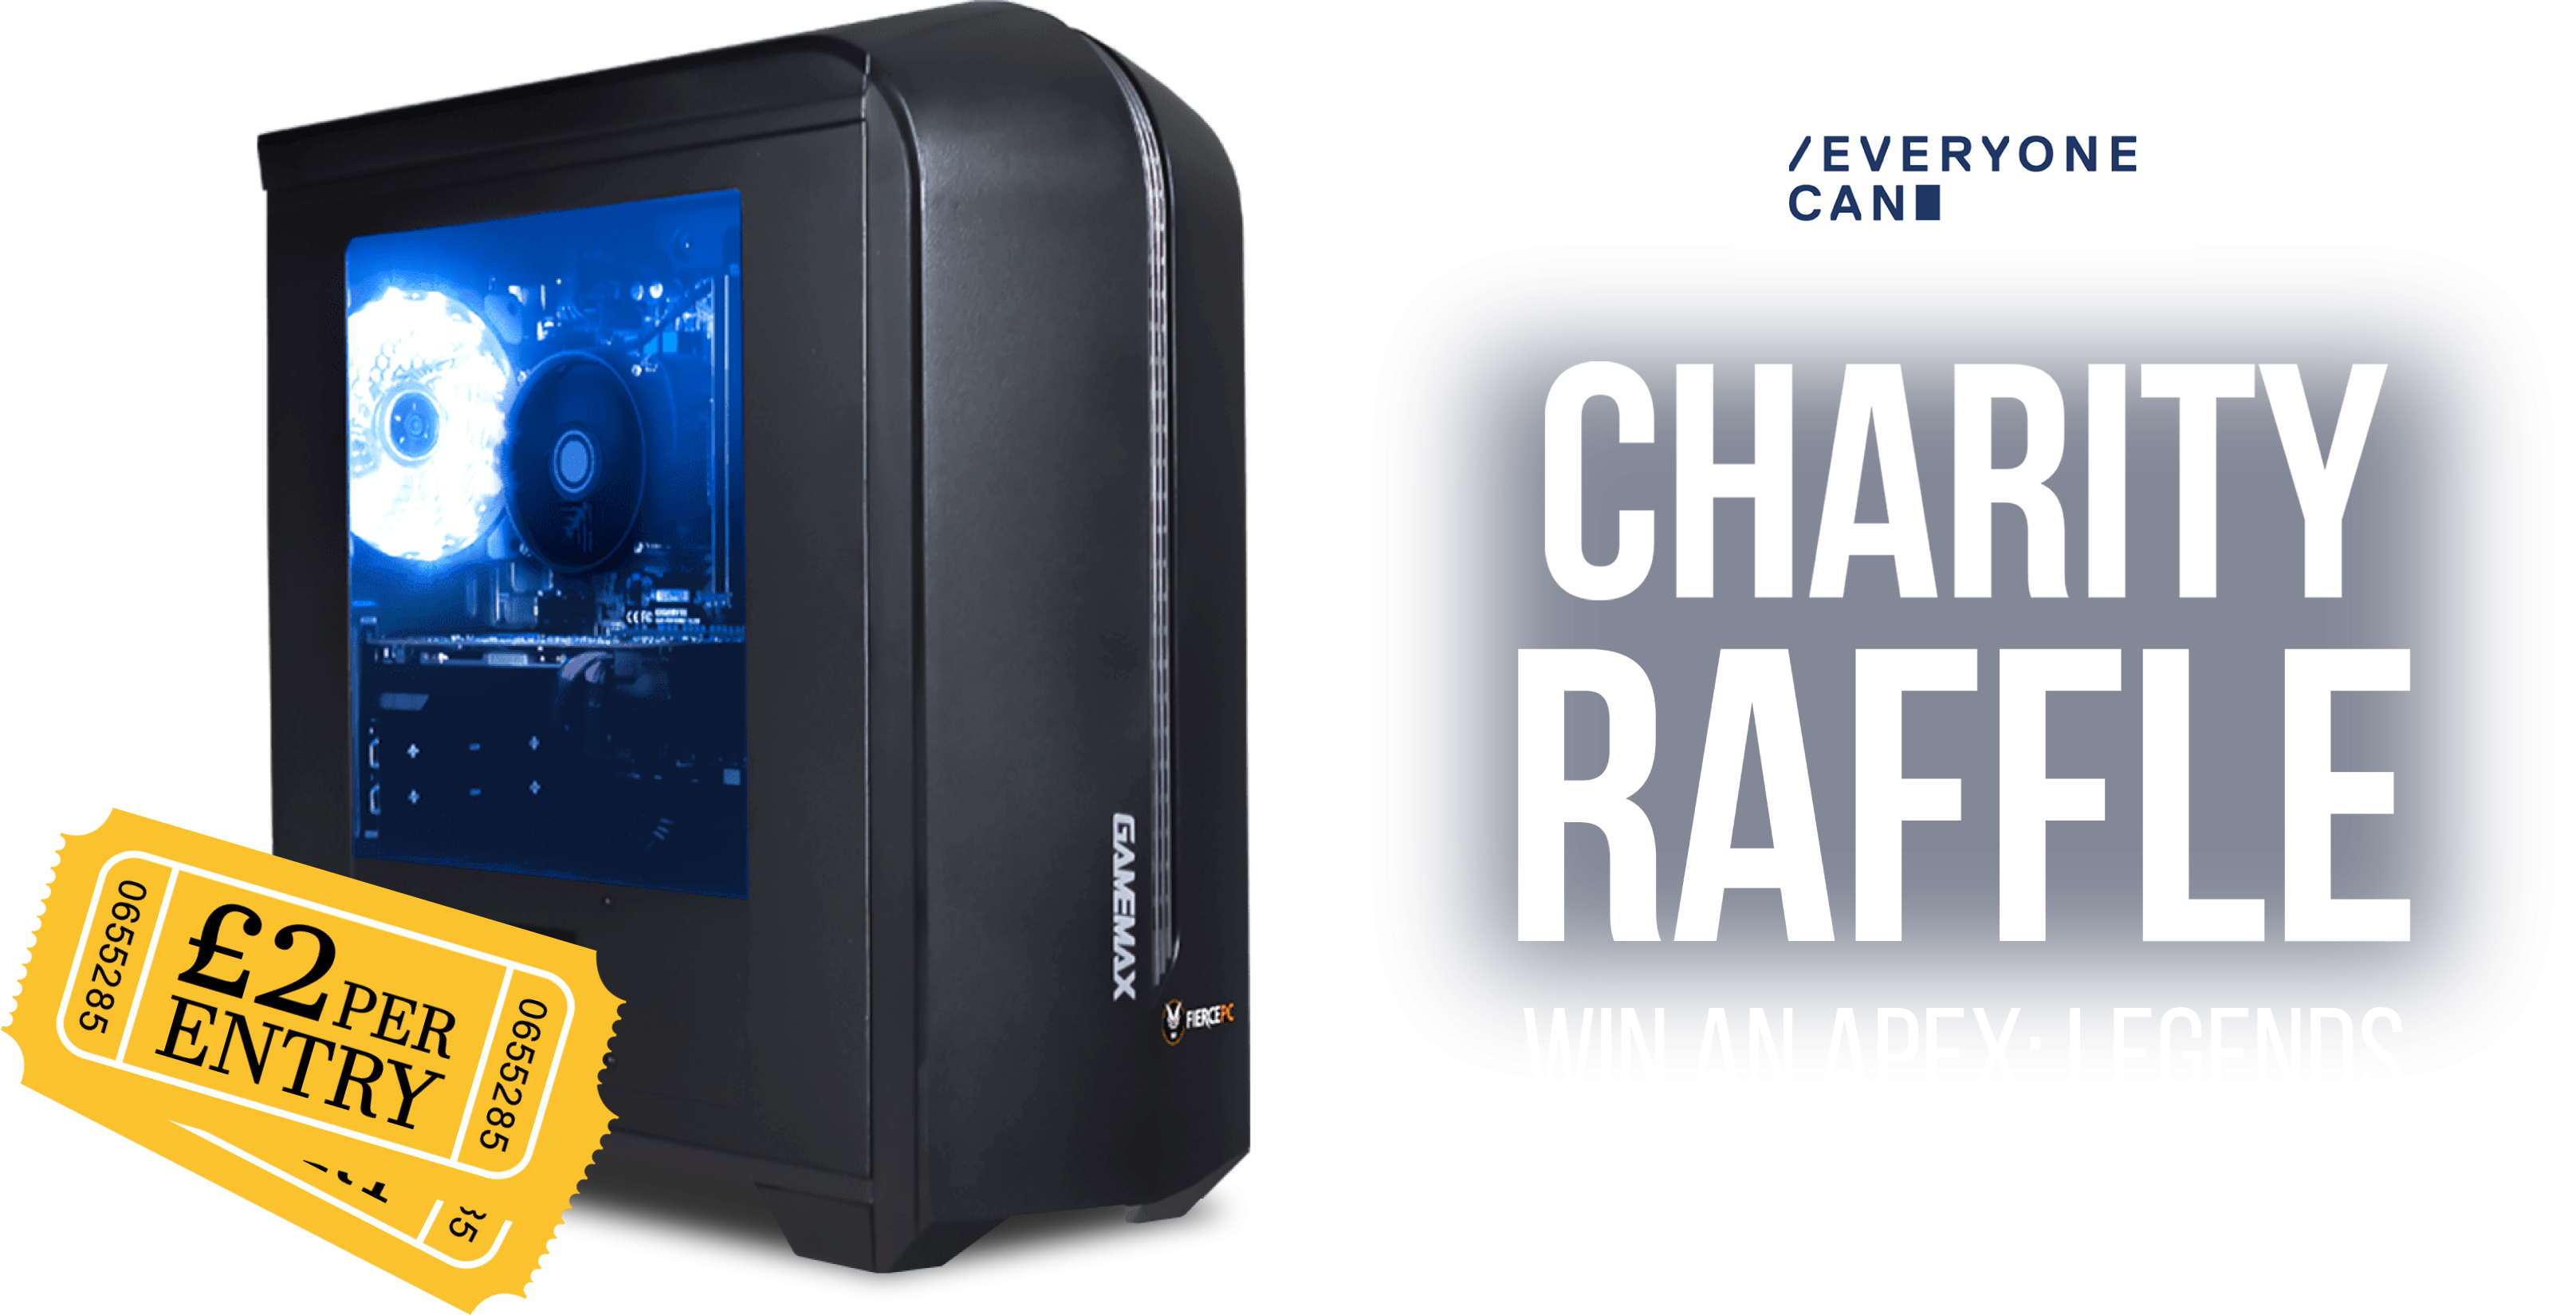 Charity Raffle. Win an Apex: Legends Mirage PC